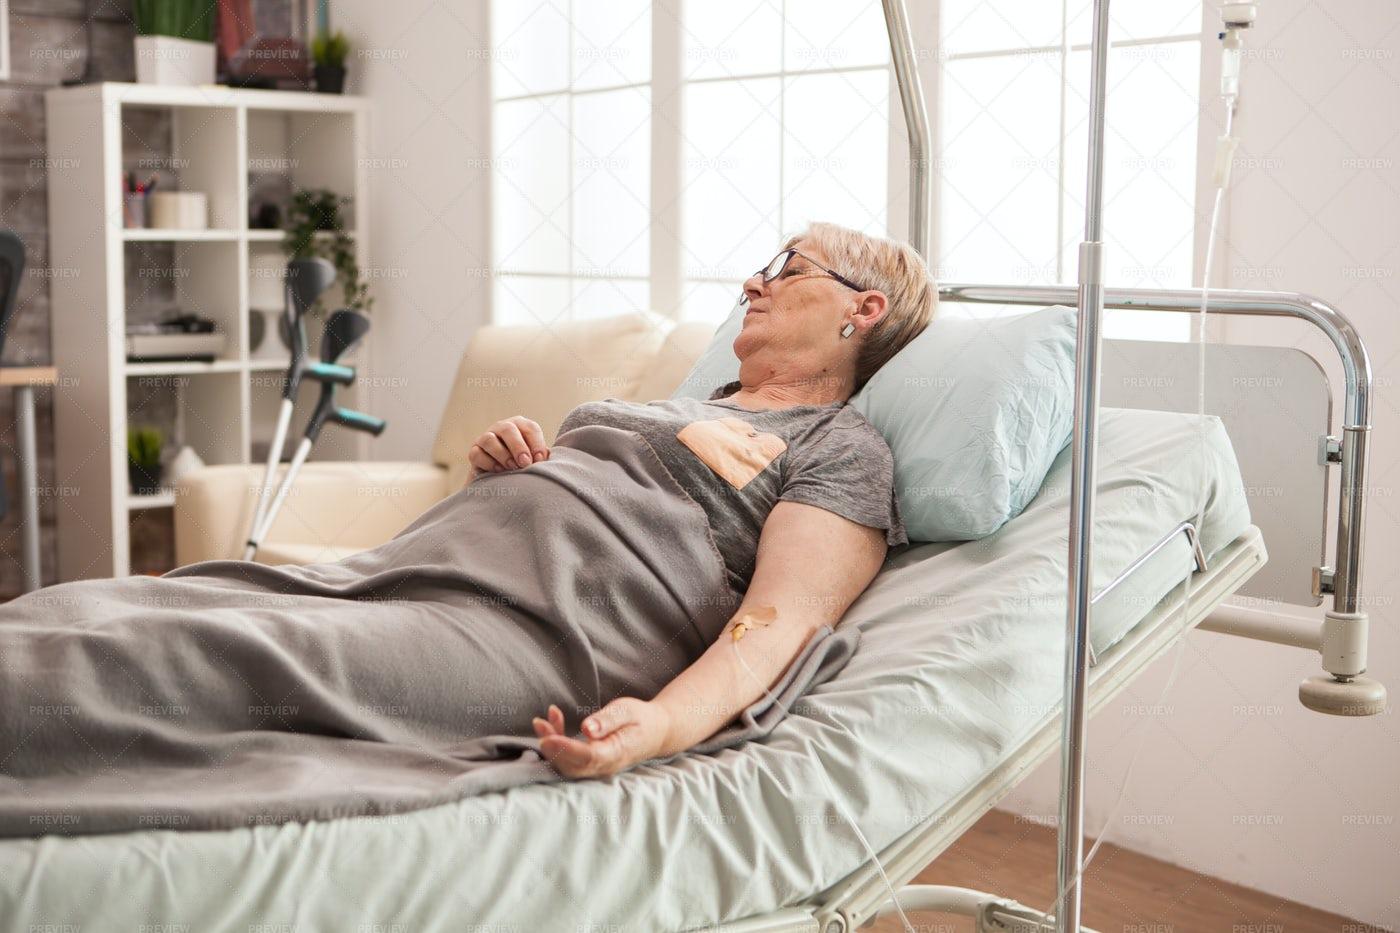 Elderly Woman In The Hospital: Stock Photos